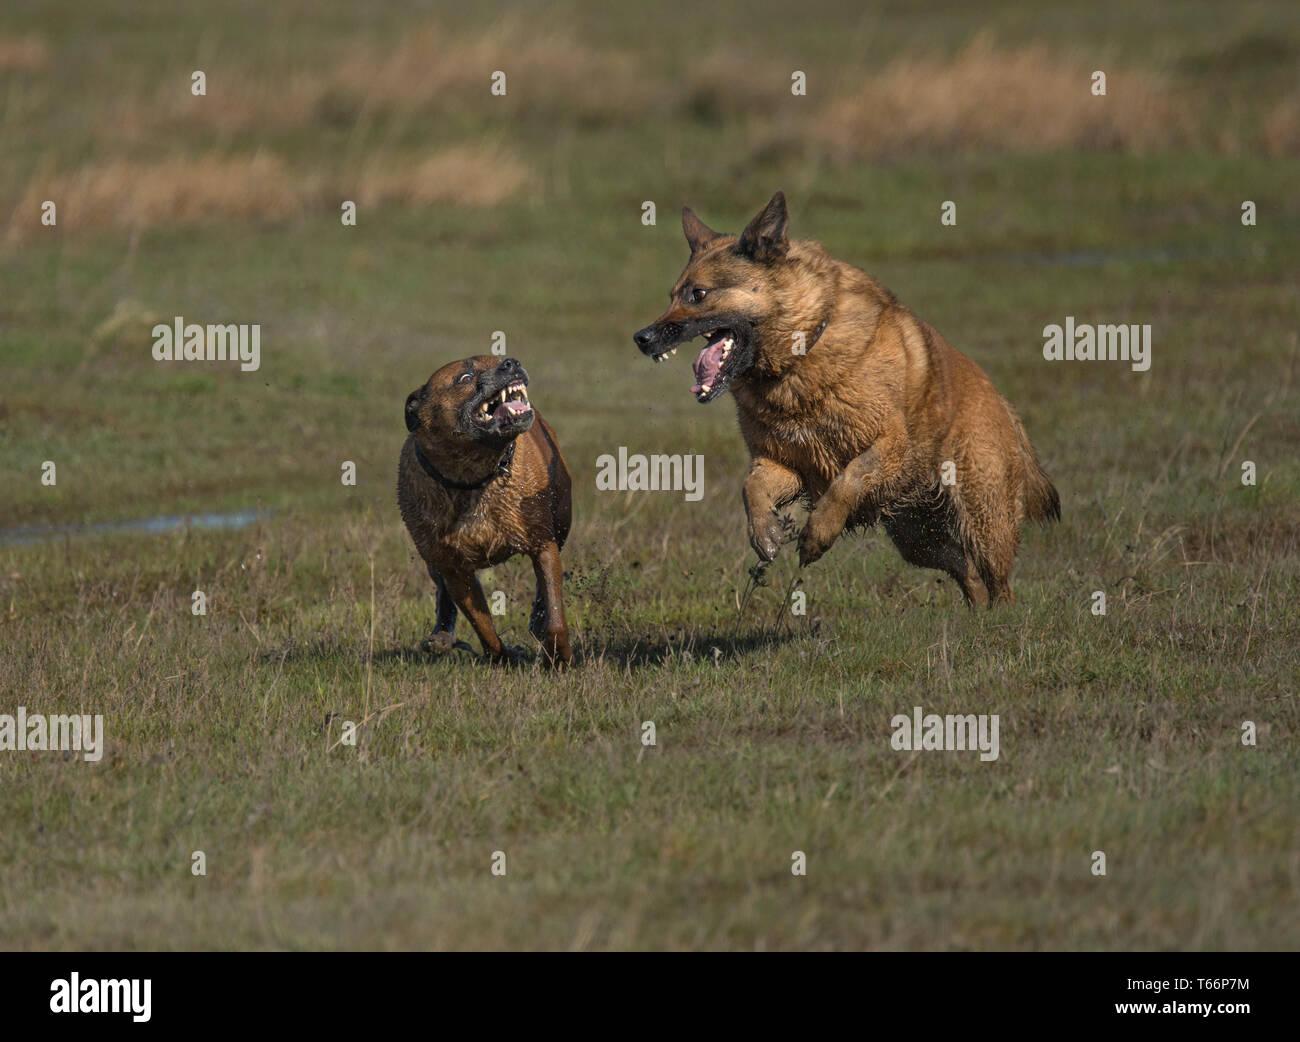 Two dogs, fighting in salt marsh, Morecambe Bay, UK - Stock Image